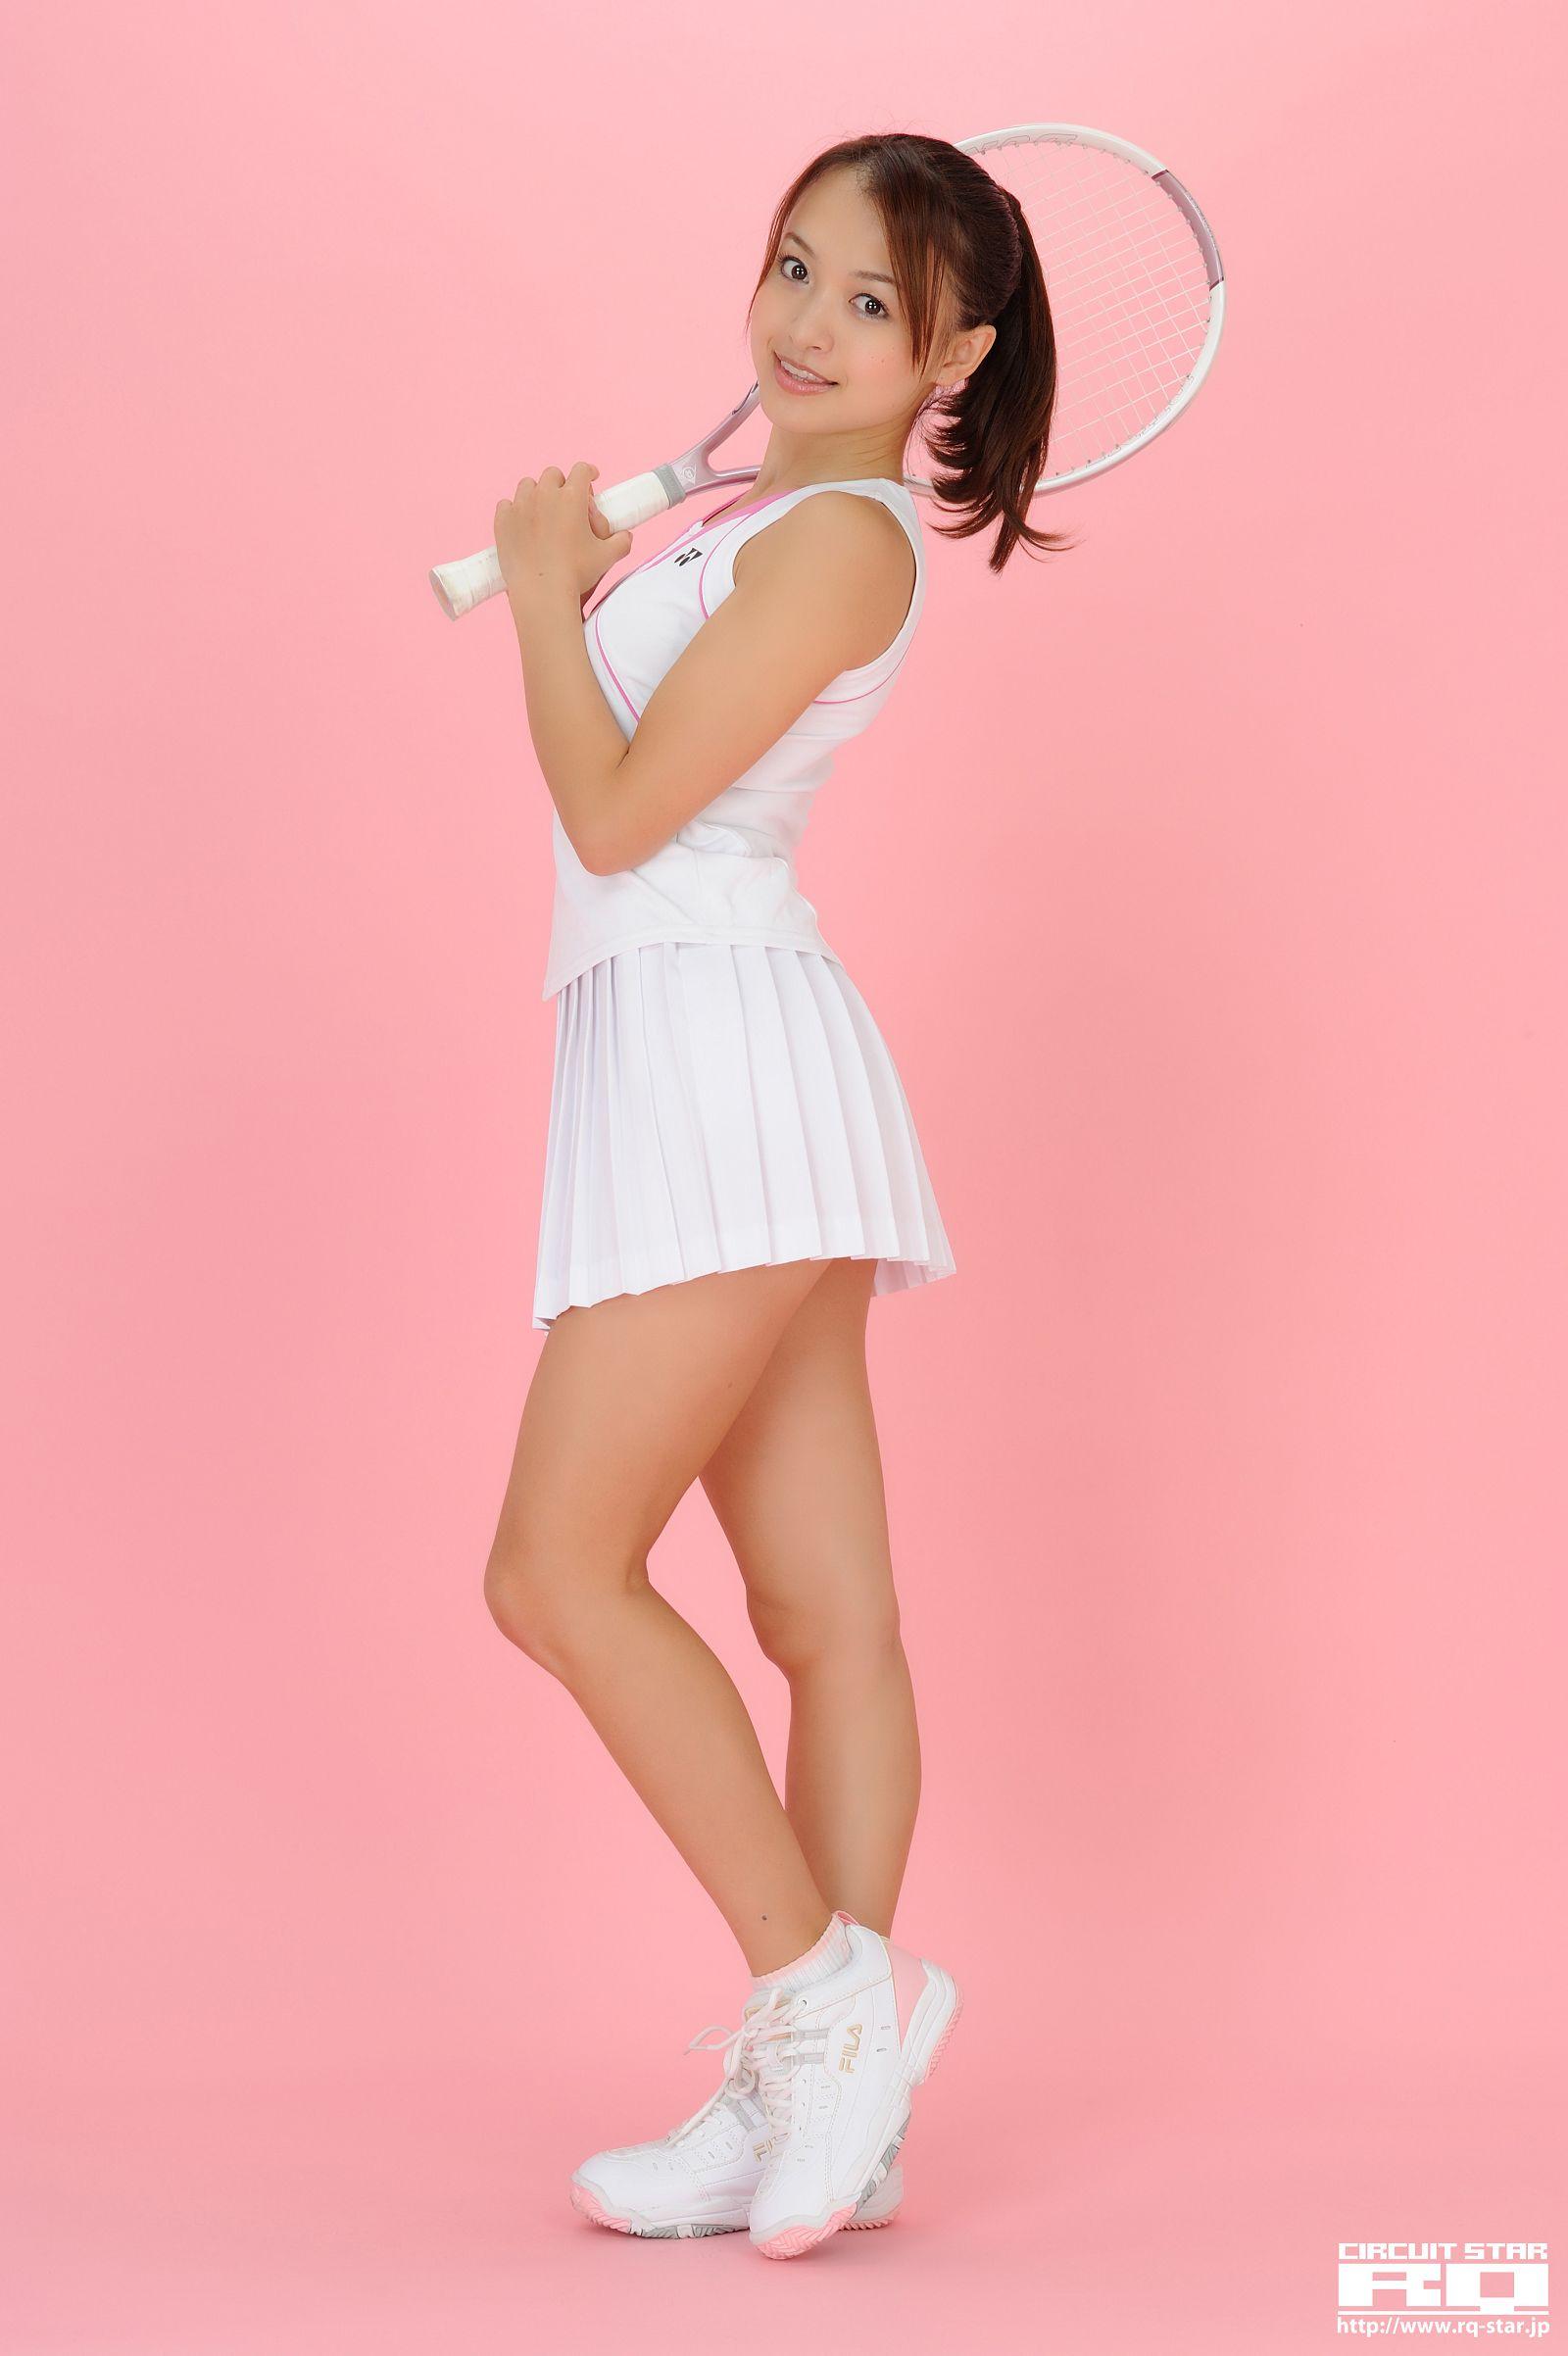 [RQ STAR美女] NO.00434 Rina Itoh 伊東りな Tennis Wear[100P] RQ STAR 第4张